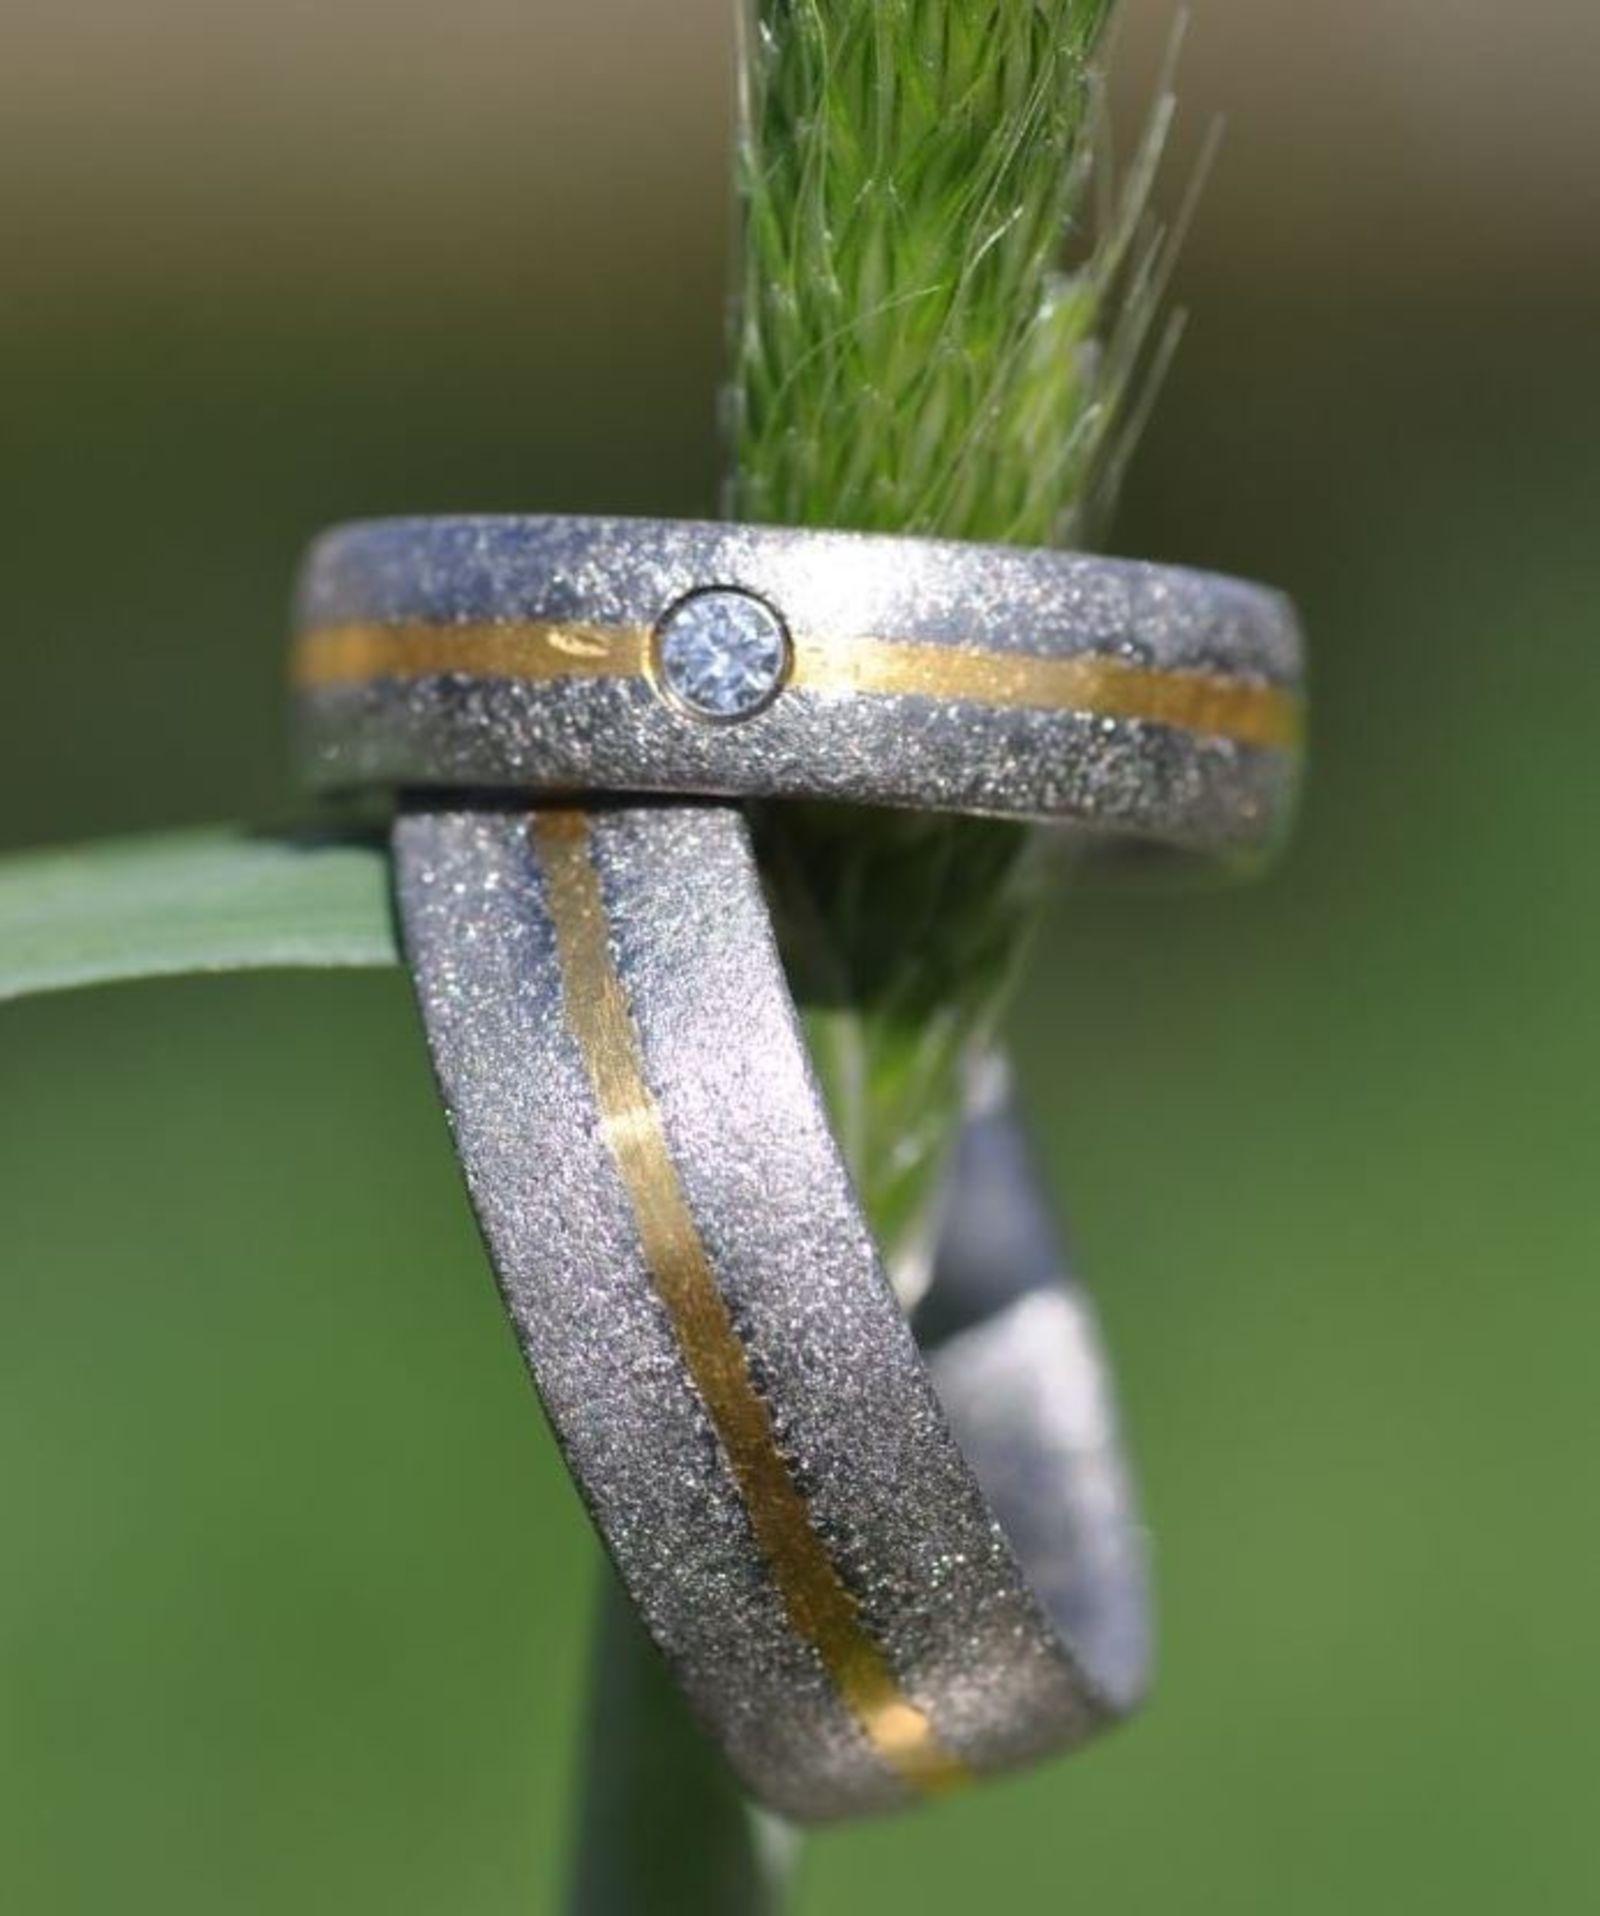 Kristallmetall (Bild 1)